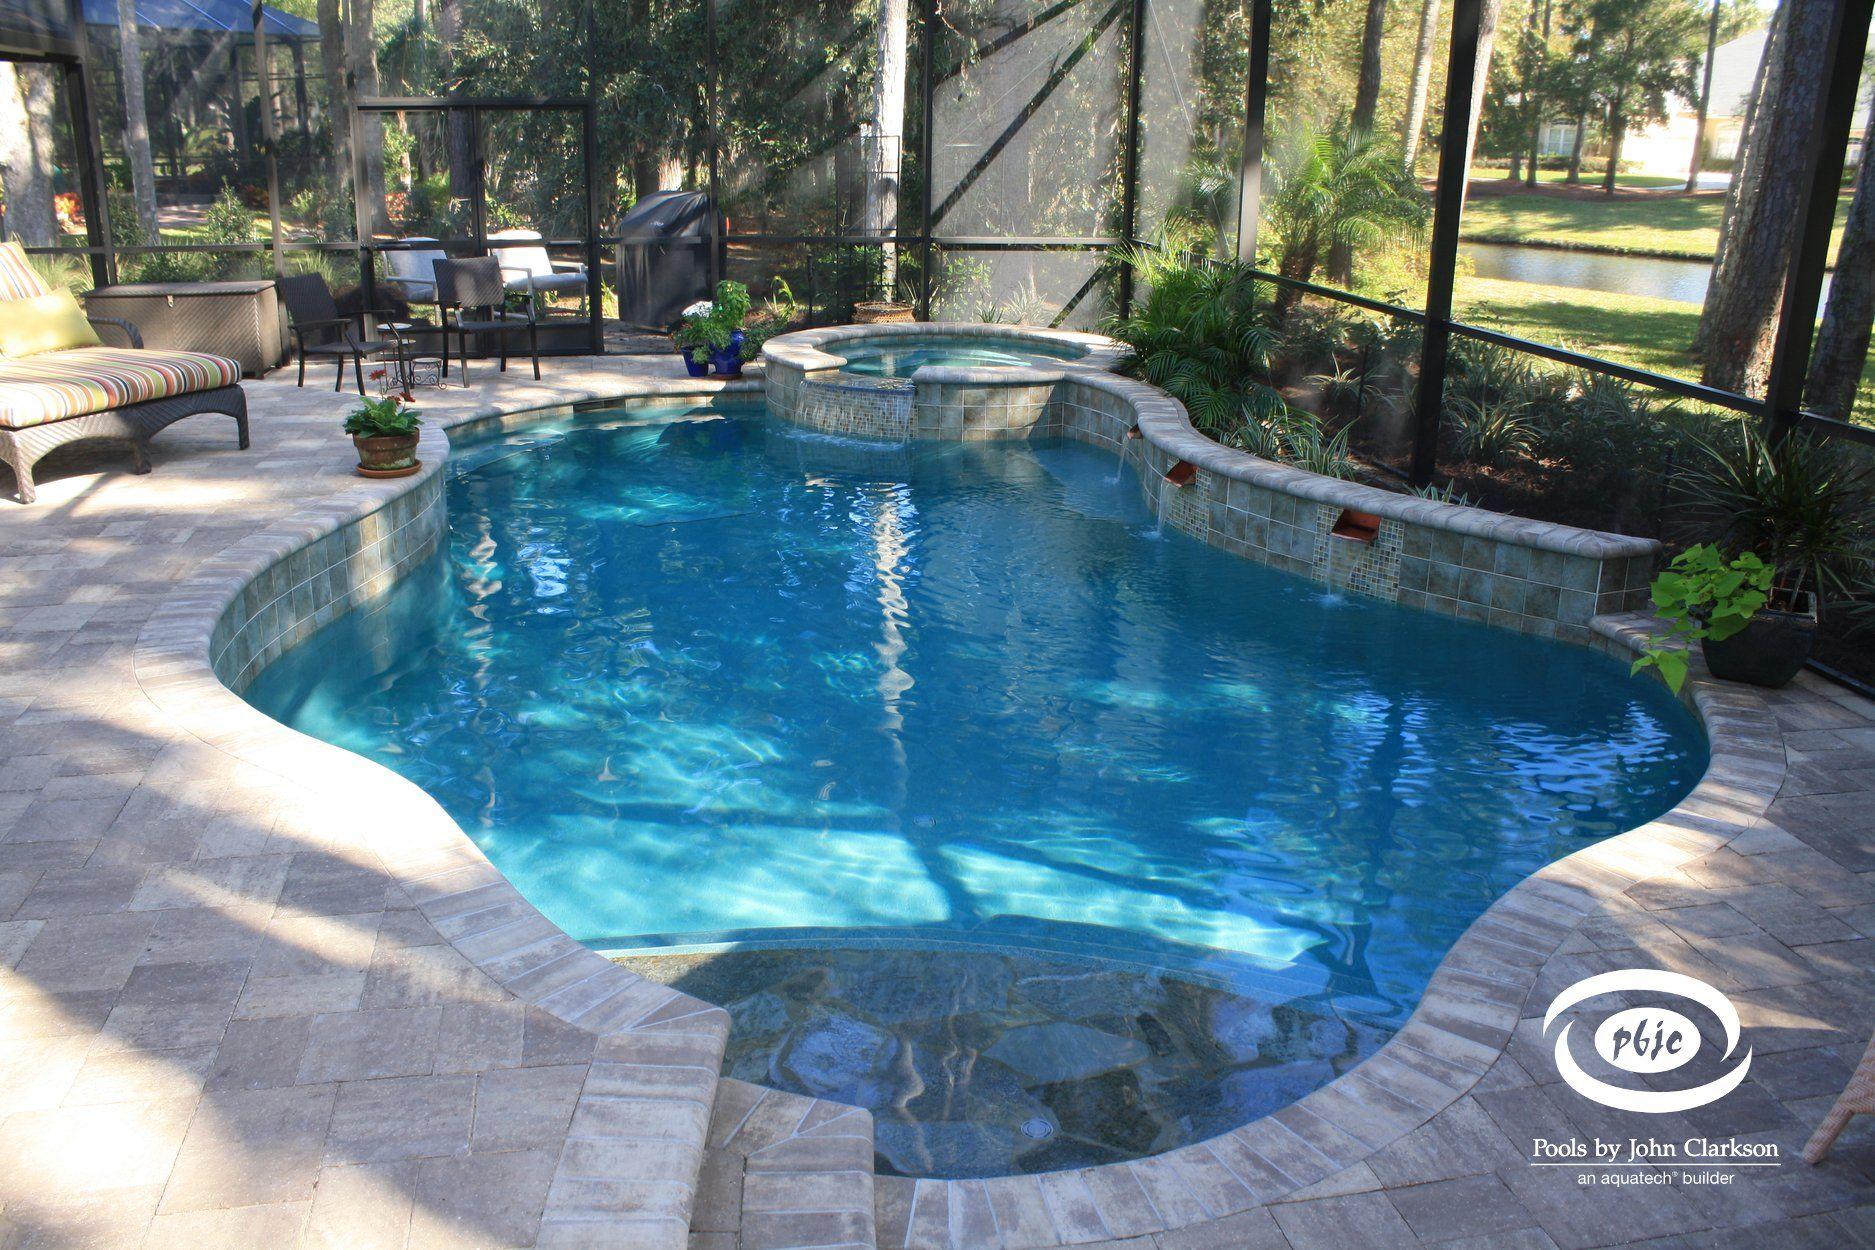 Freeform Swimming Pools In Northeast Florida Pools By John Clarkson Florida Pools Pool Swimming Pools